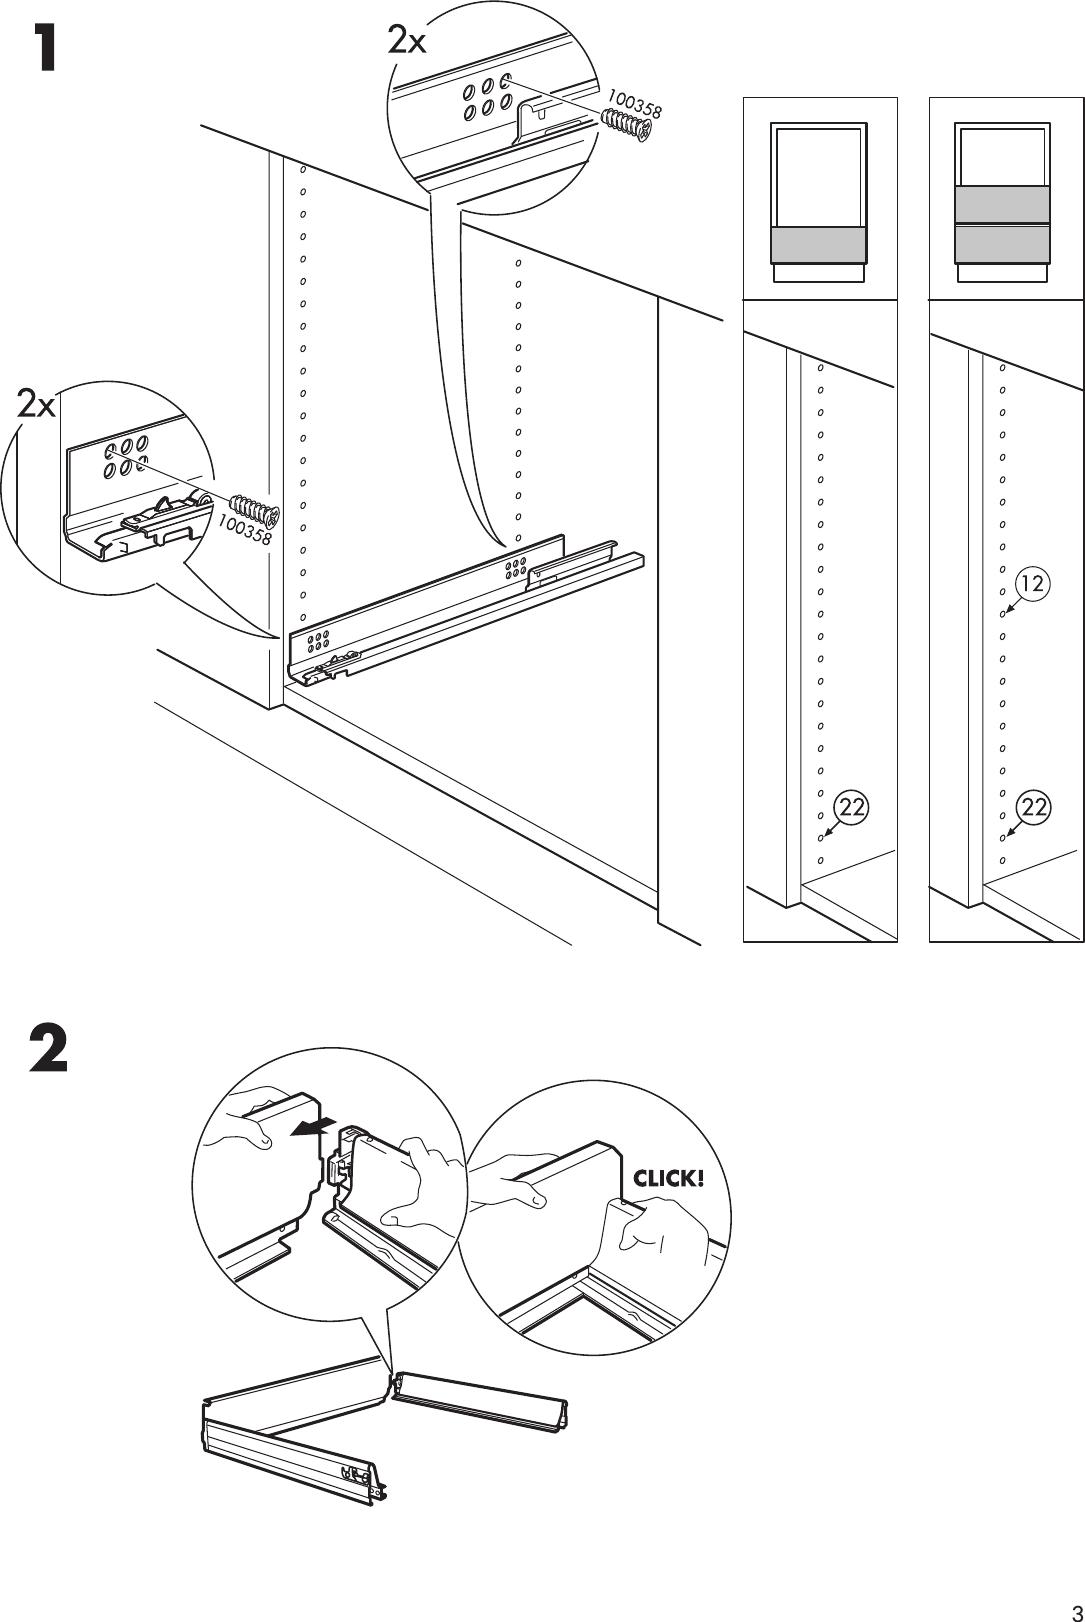 Ikea Faktum Drawer Instructions